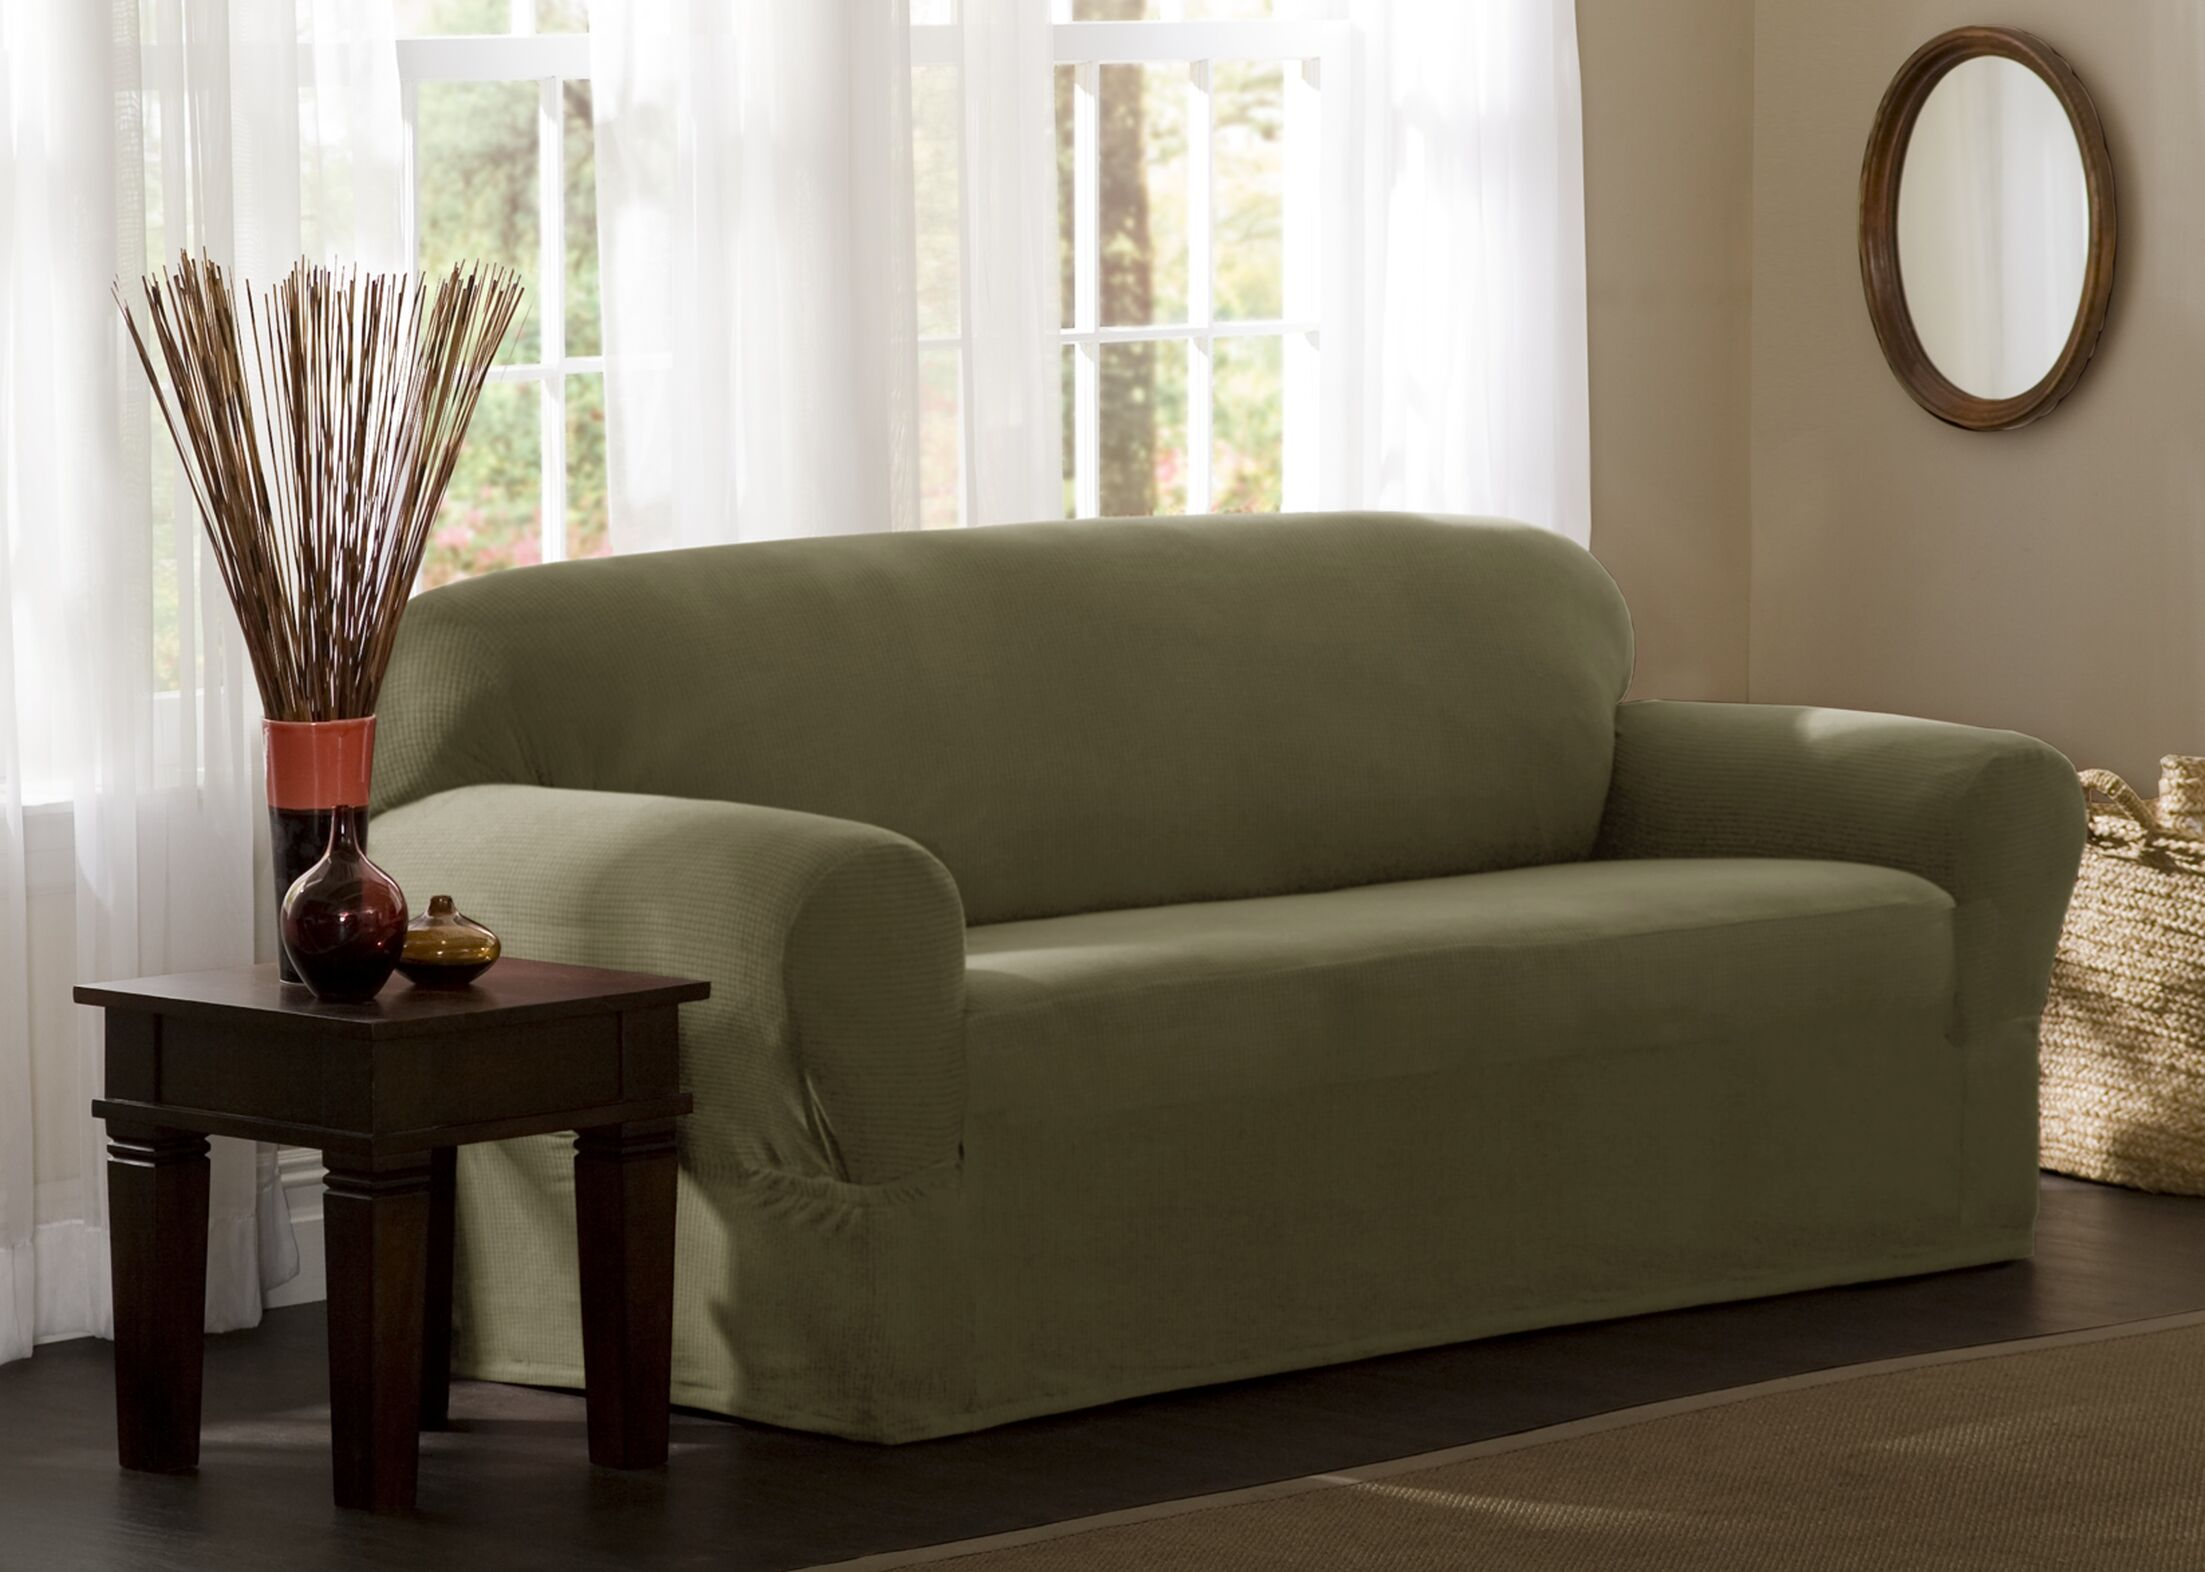 Box Cushion Sofa Slipcover Upholstery: Dark Sage